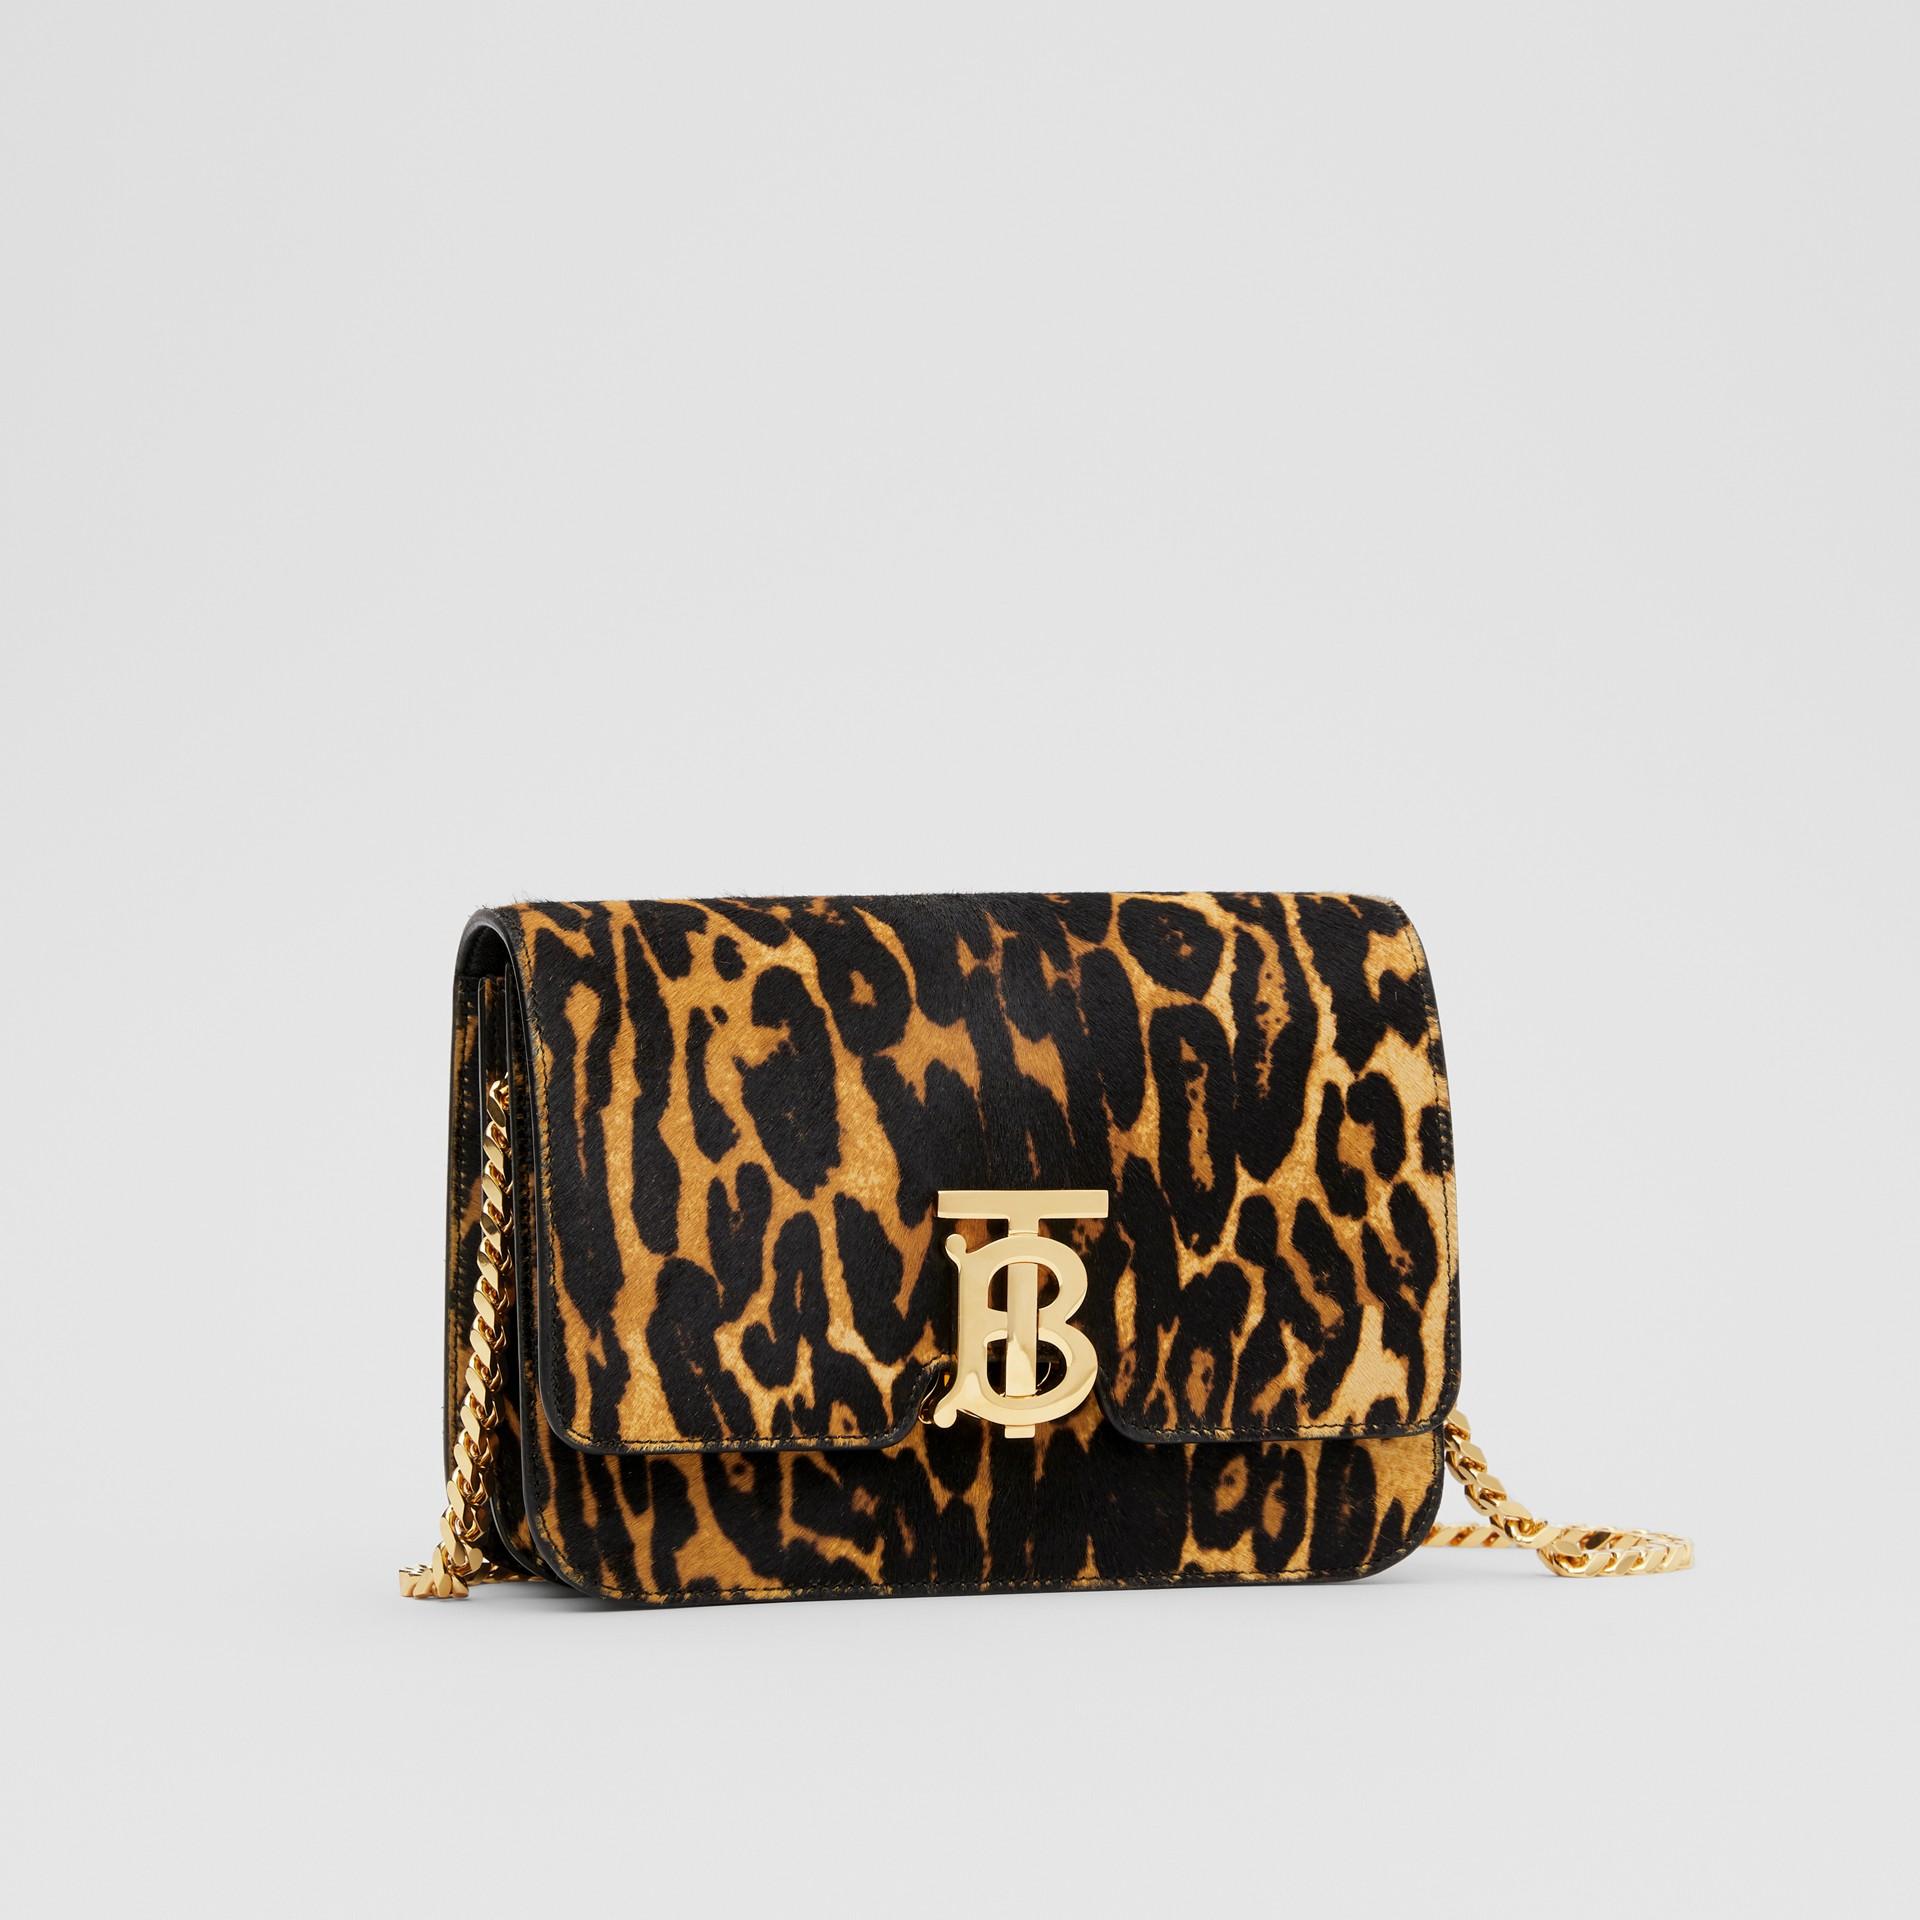 Small Leopard Print Calf Hair TB Bag in Dark Mustard - Women | Burberry Hong Kong S.A.R - gallery image 6